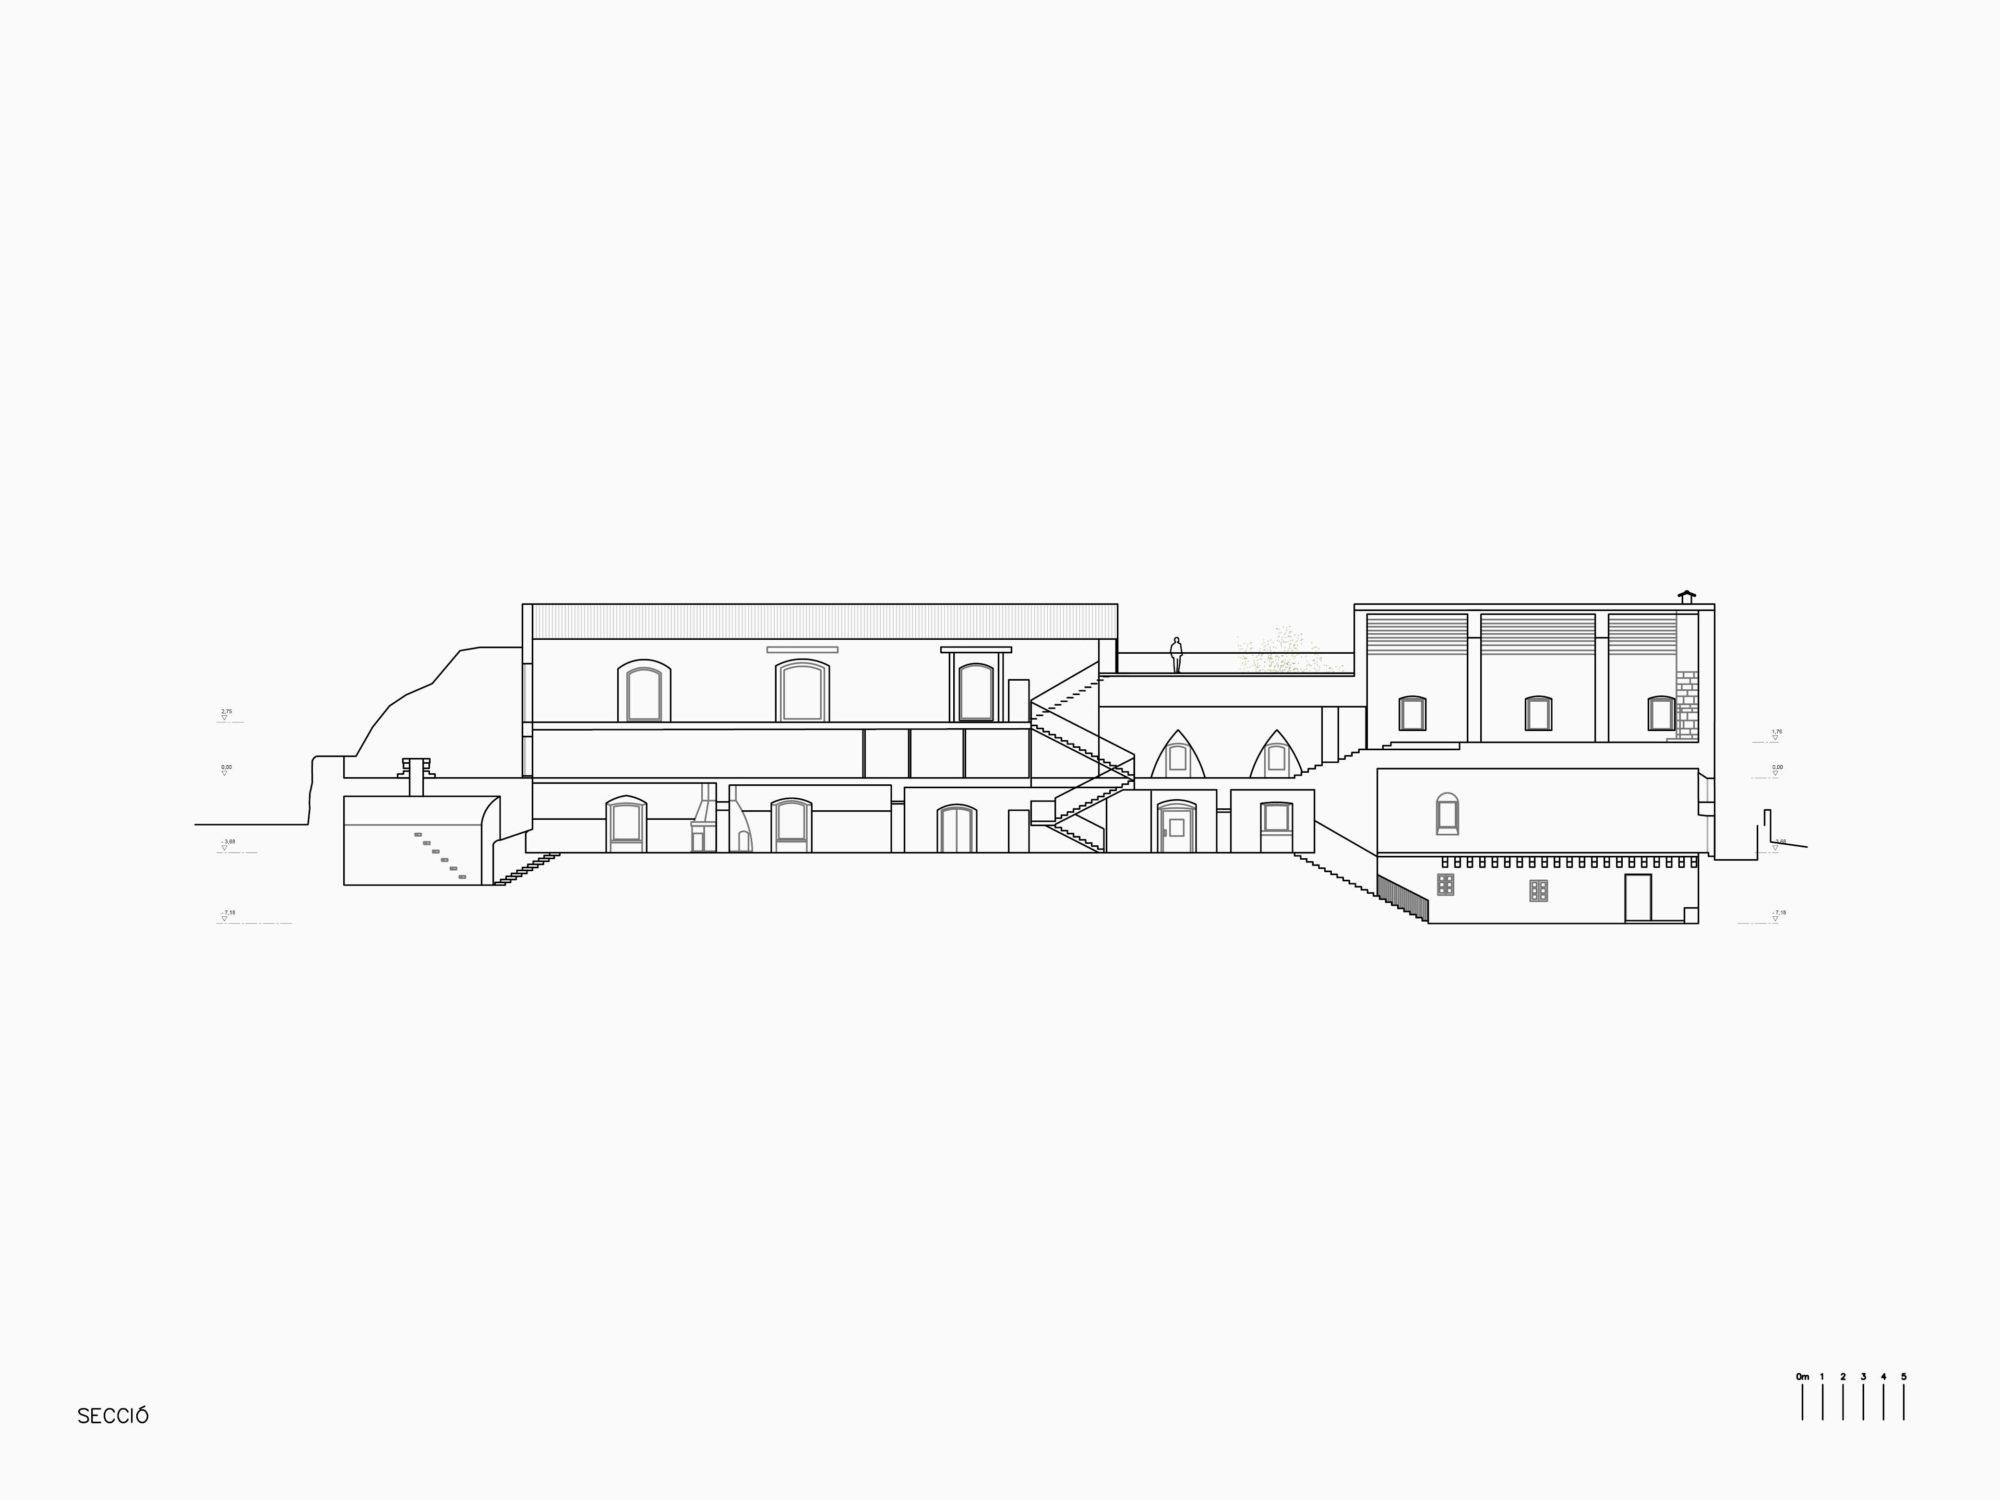 Hostalric's Castle - Garcés - de Seta - Bonet